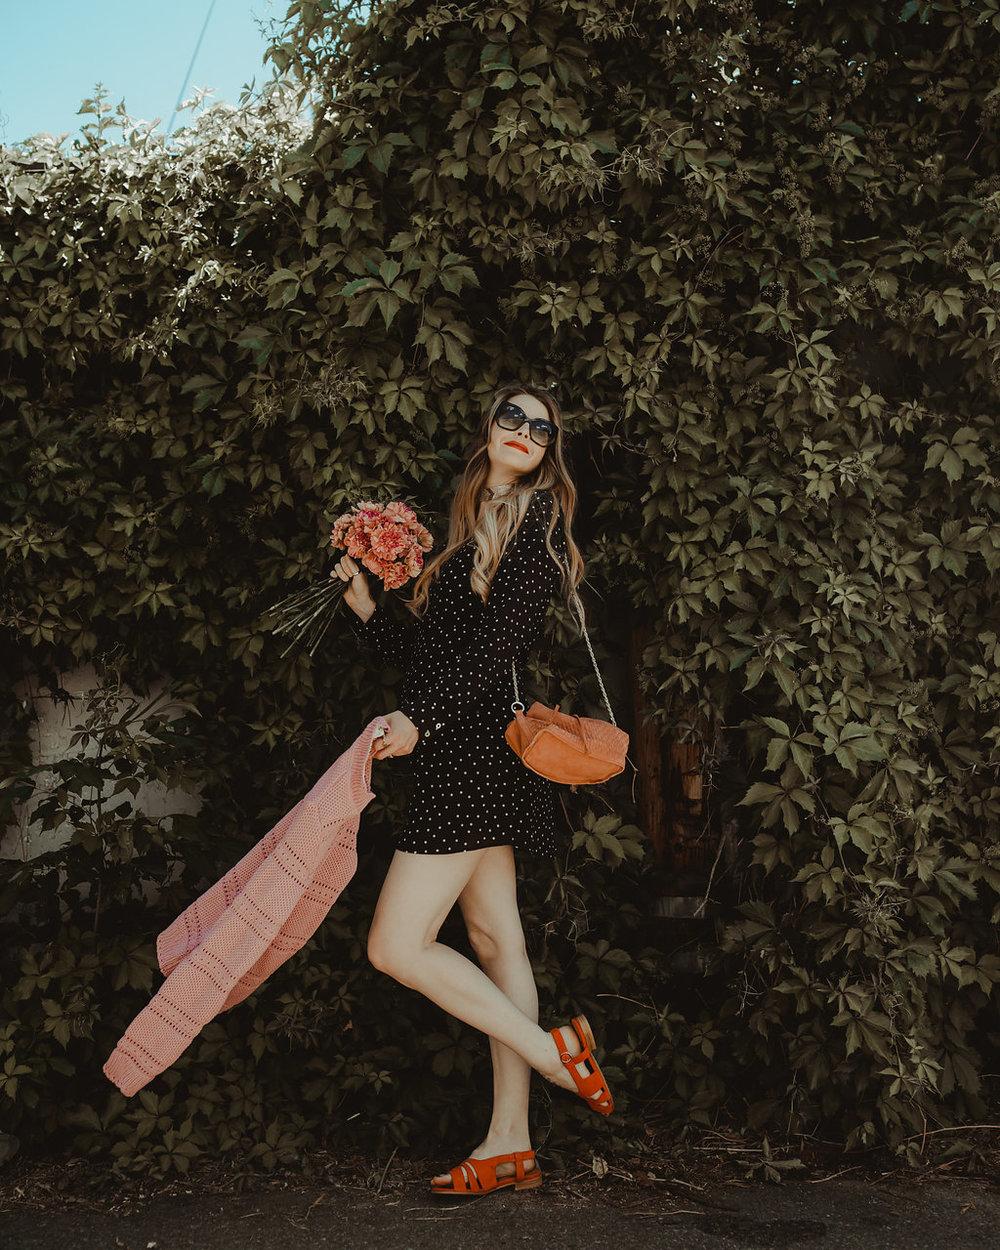 Dress  |  Shoes  |  Purse  |  Sweater  c/o Balzac Paris